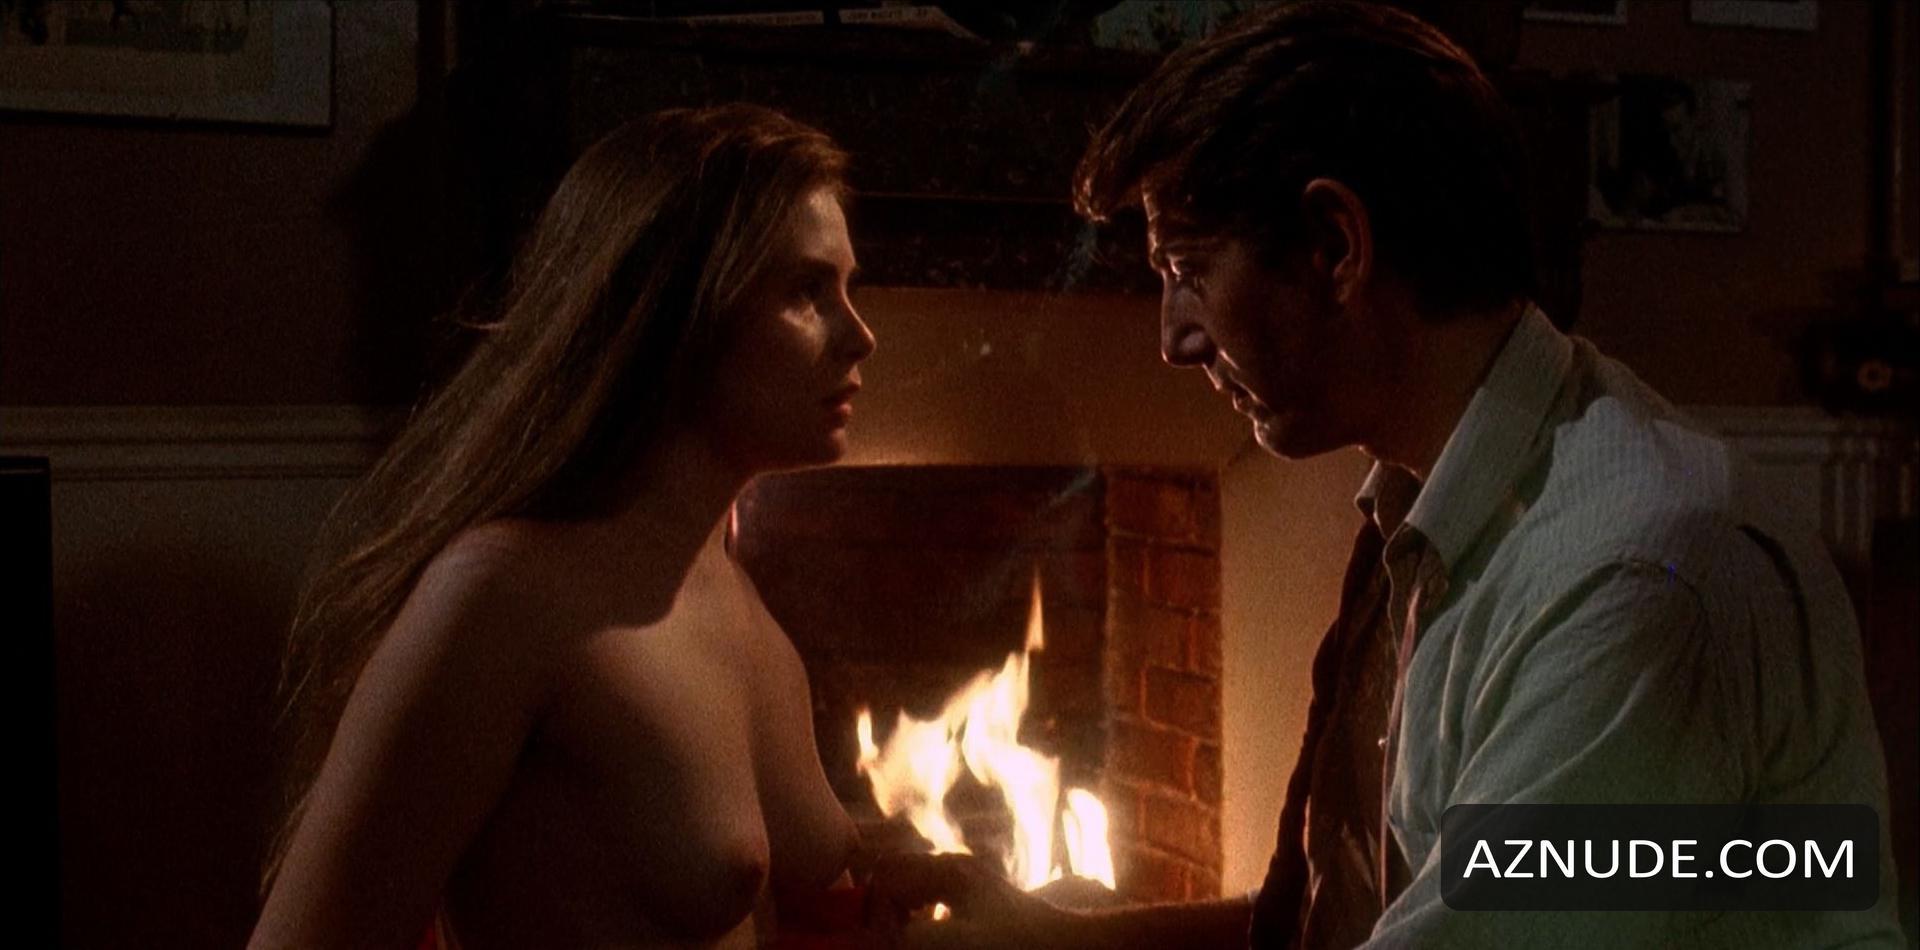 Emmanuelle seigner sex scene, shannen doherty nude playboy shoot